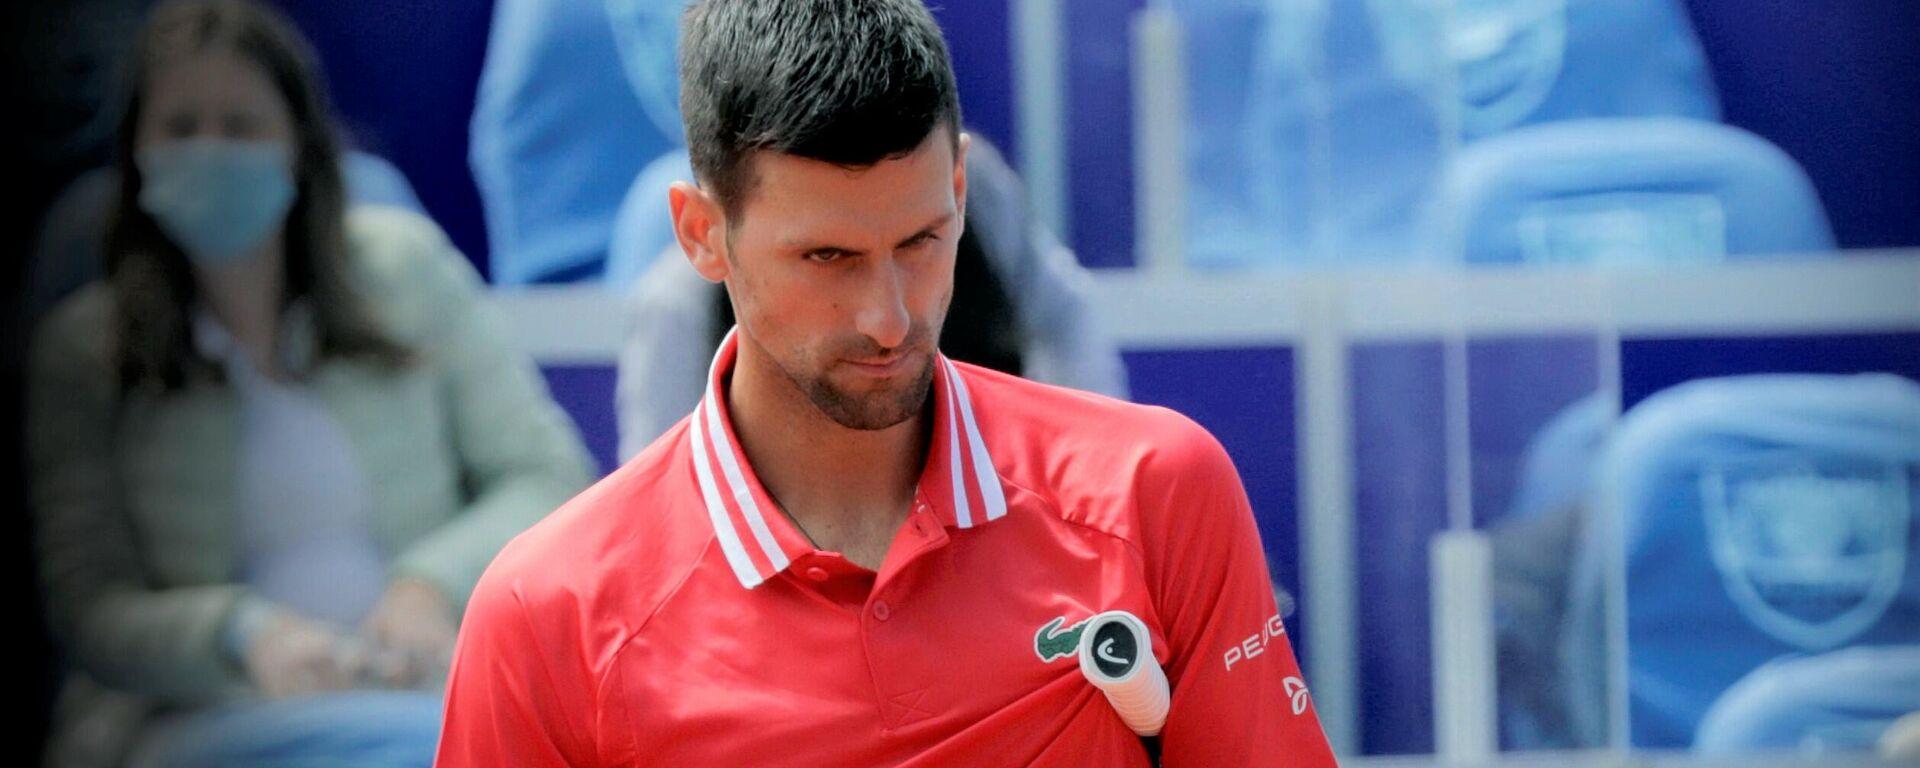 Novak Đoković - Sputnik Srbija, 1920, 01.10.2021